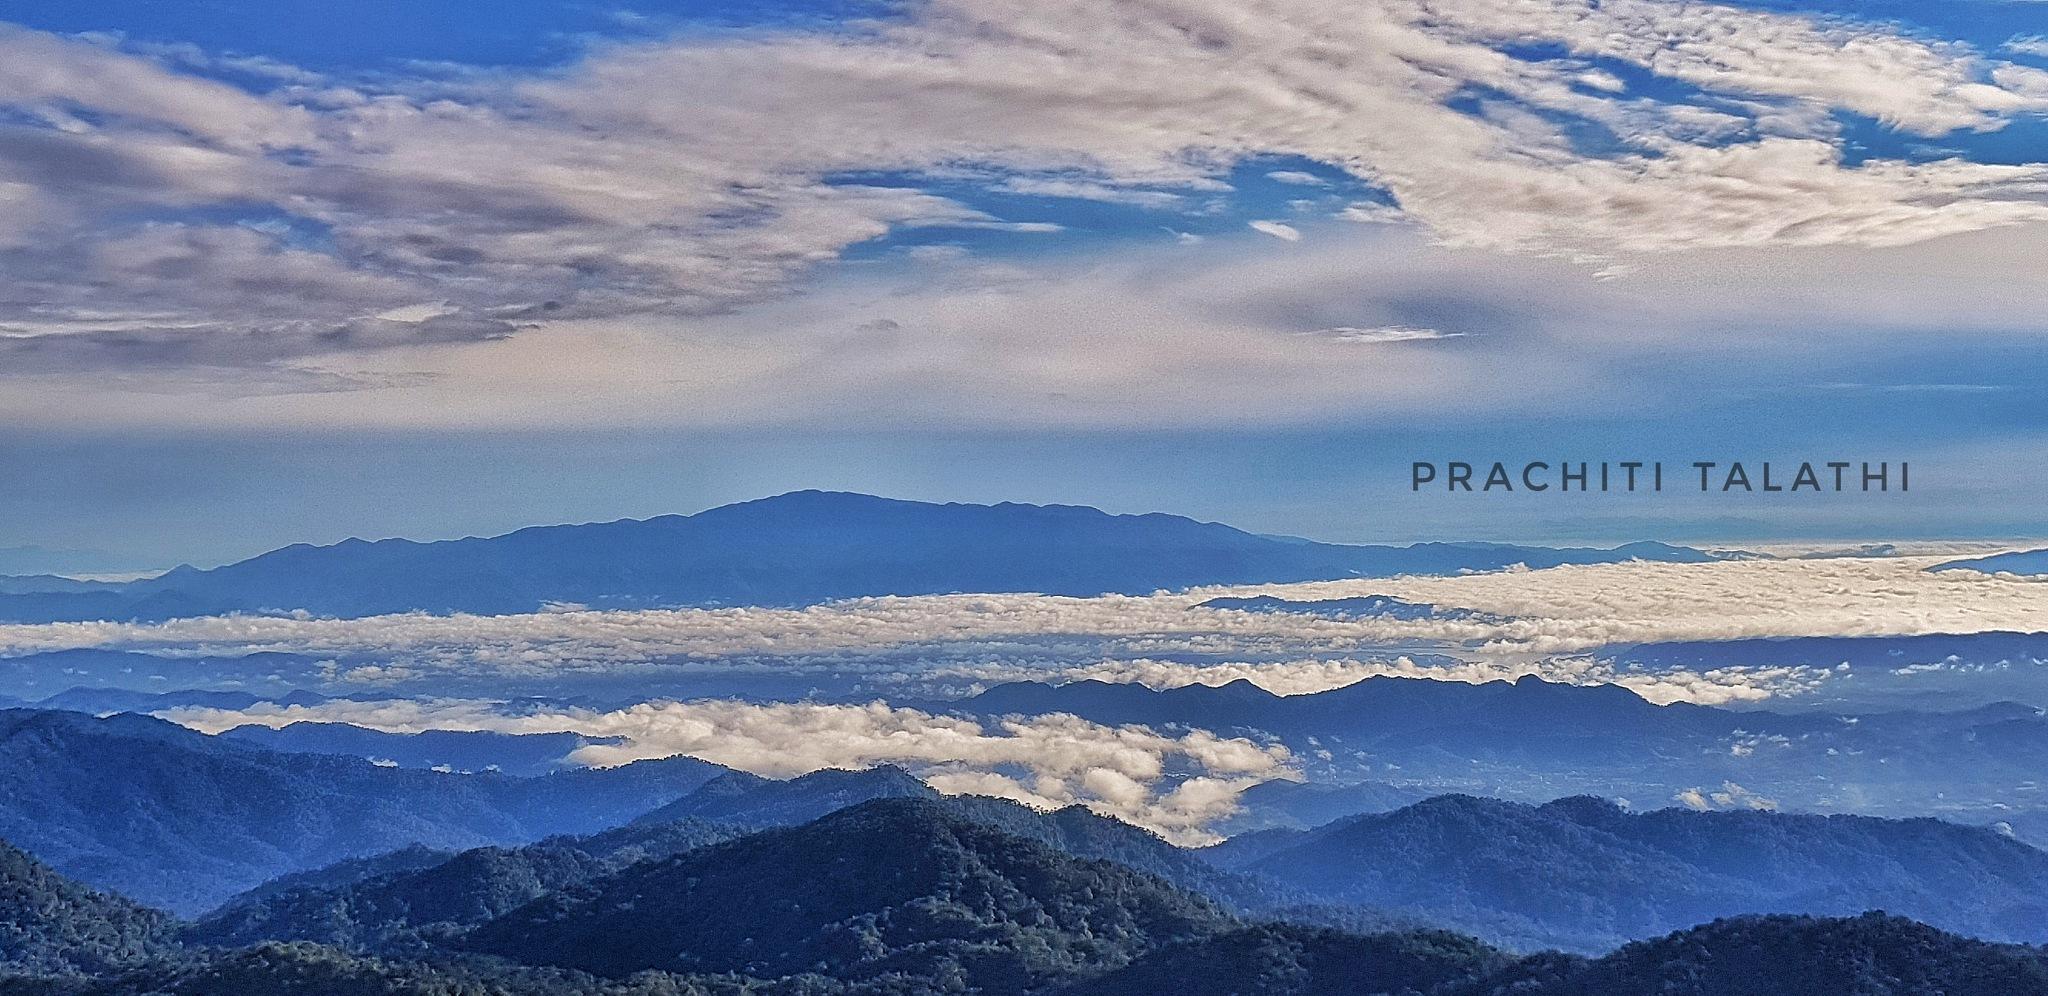 On the cloud 9 by Prachiti Talathi